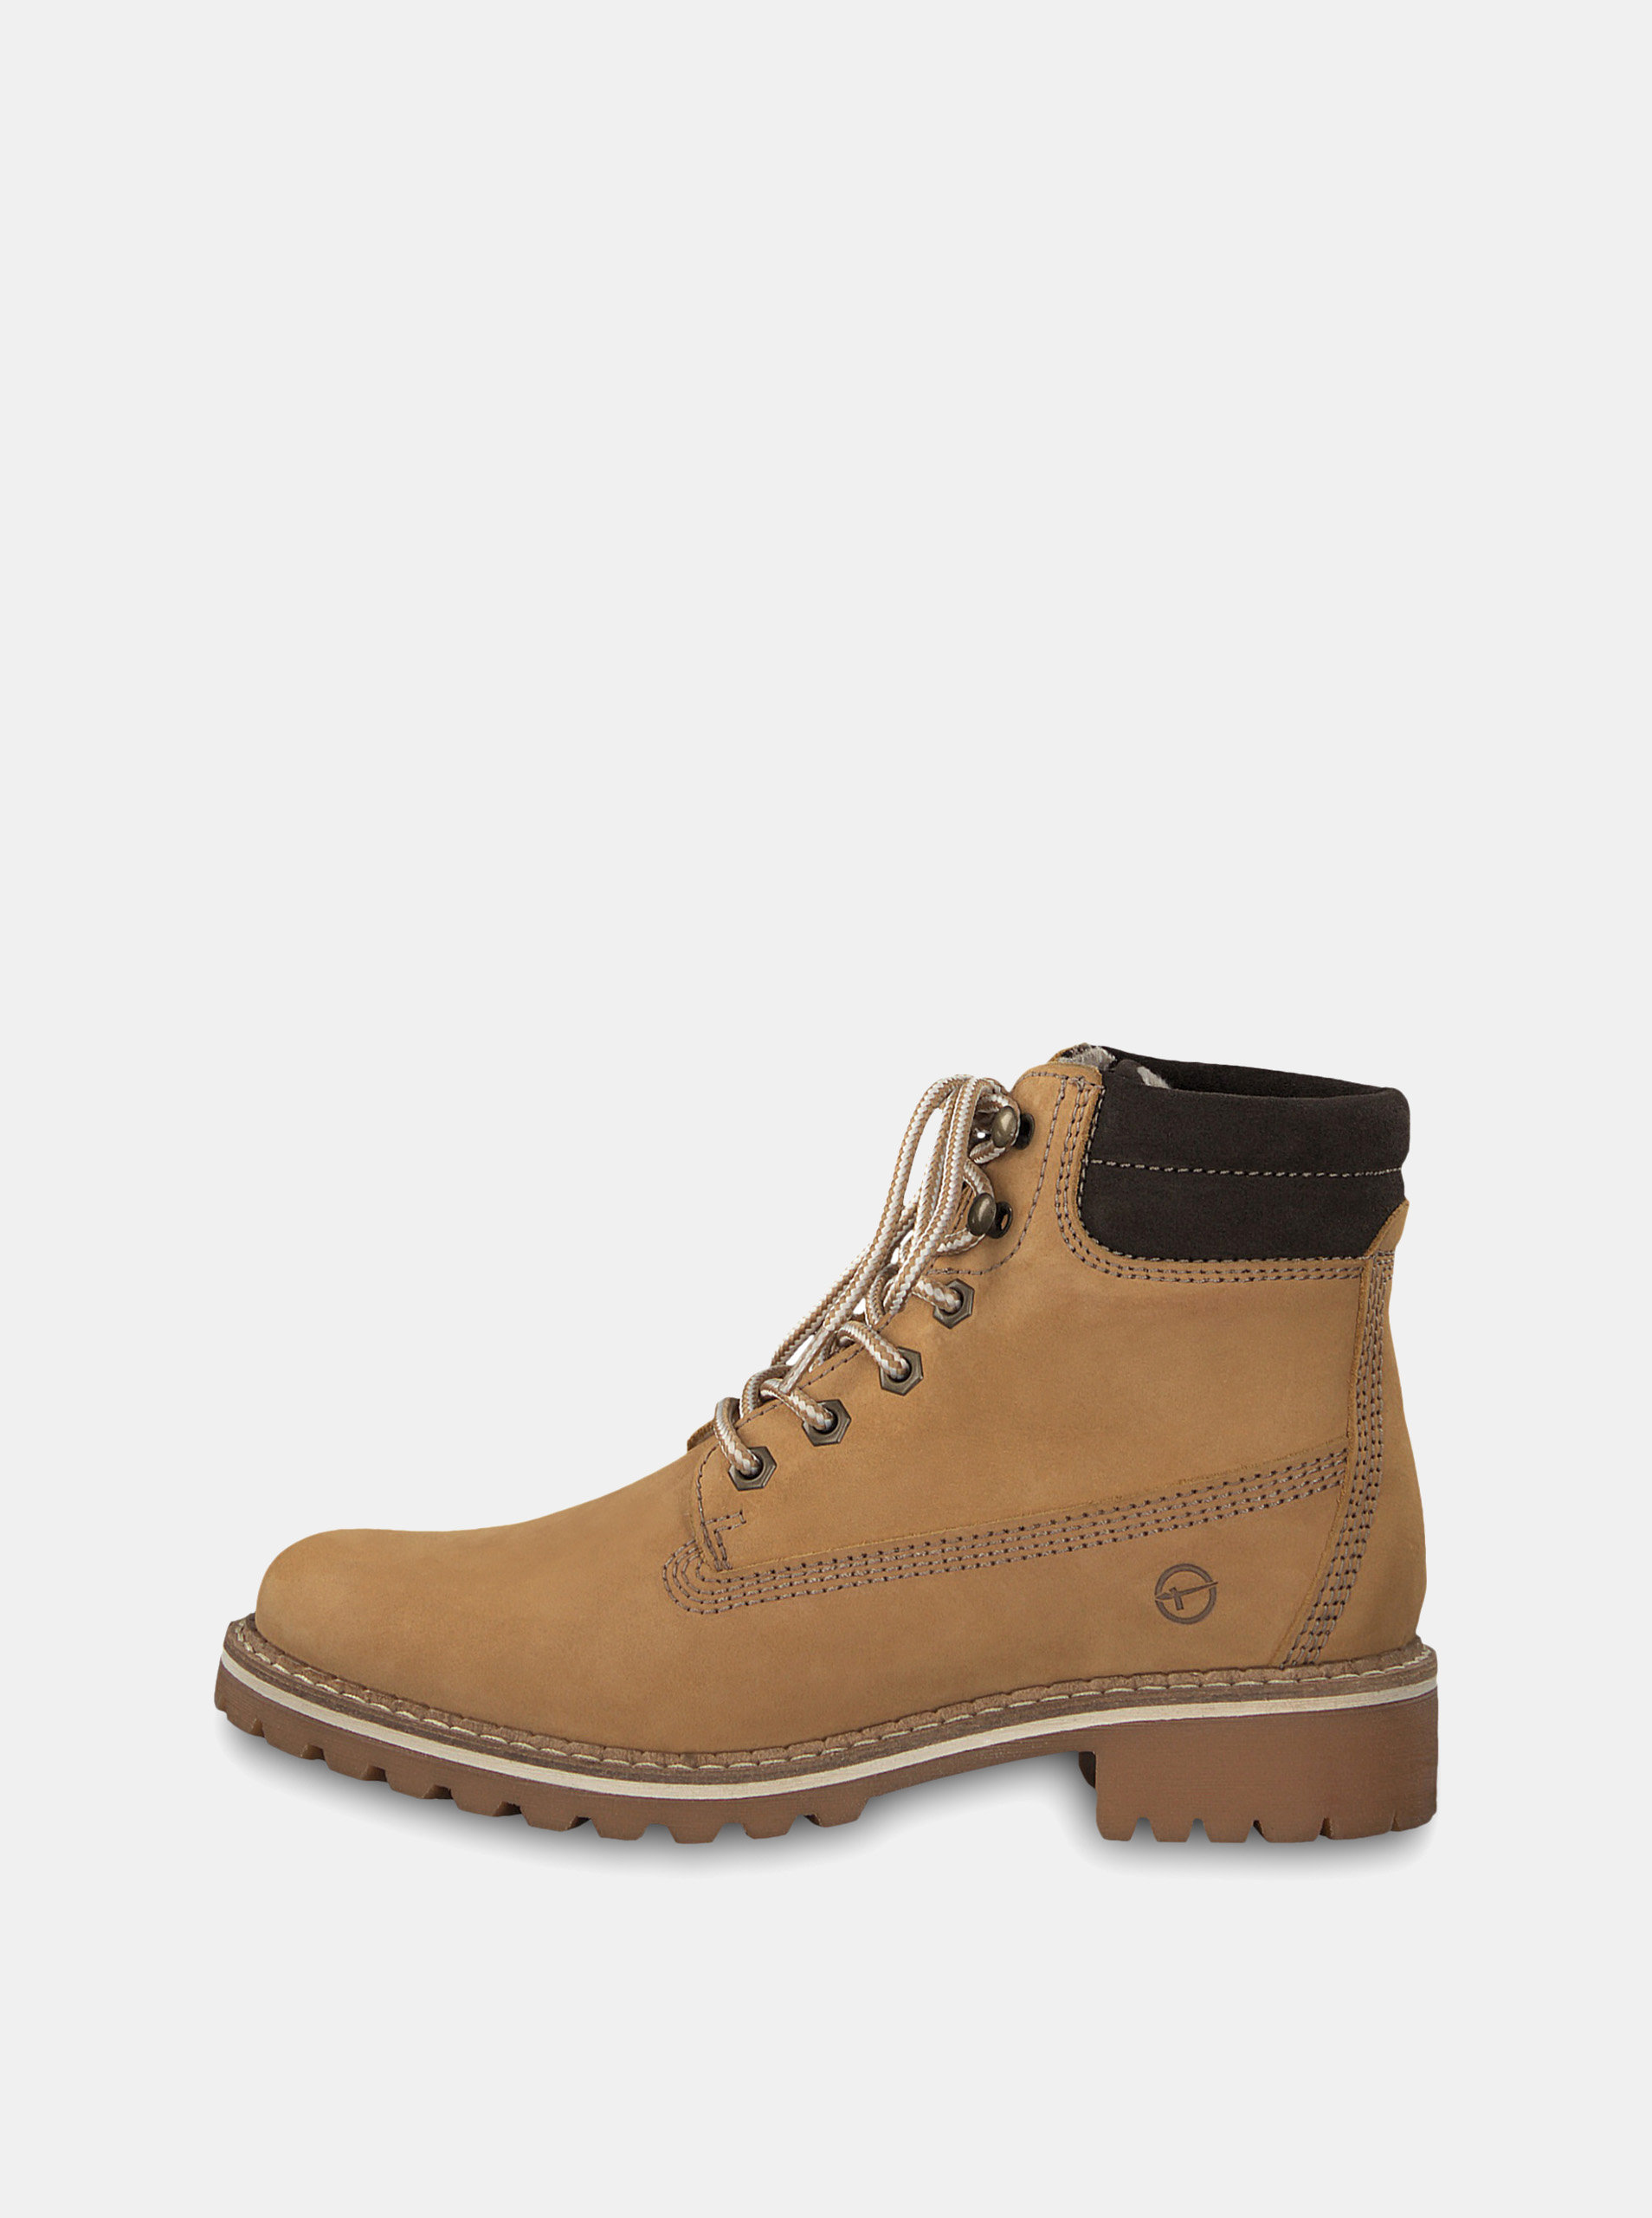 Hnědé kotníkové boty Tamaris ... 3df642bdaf